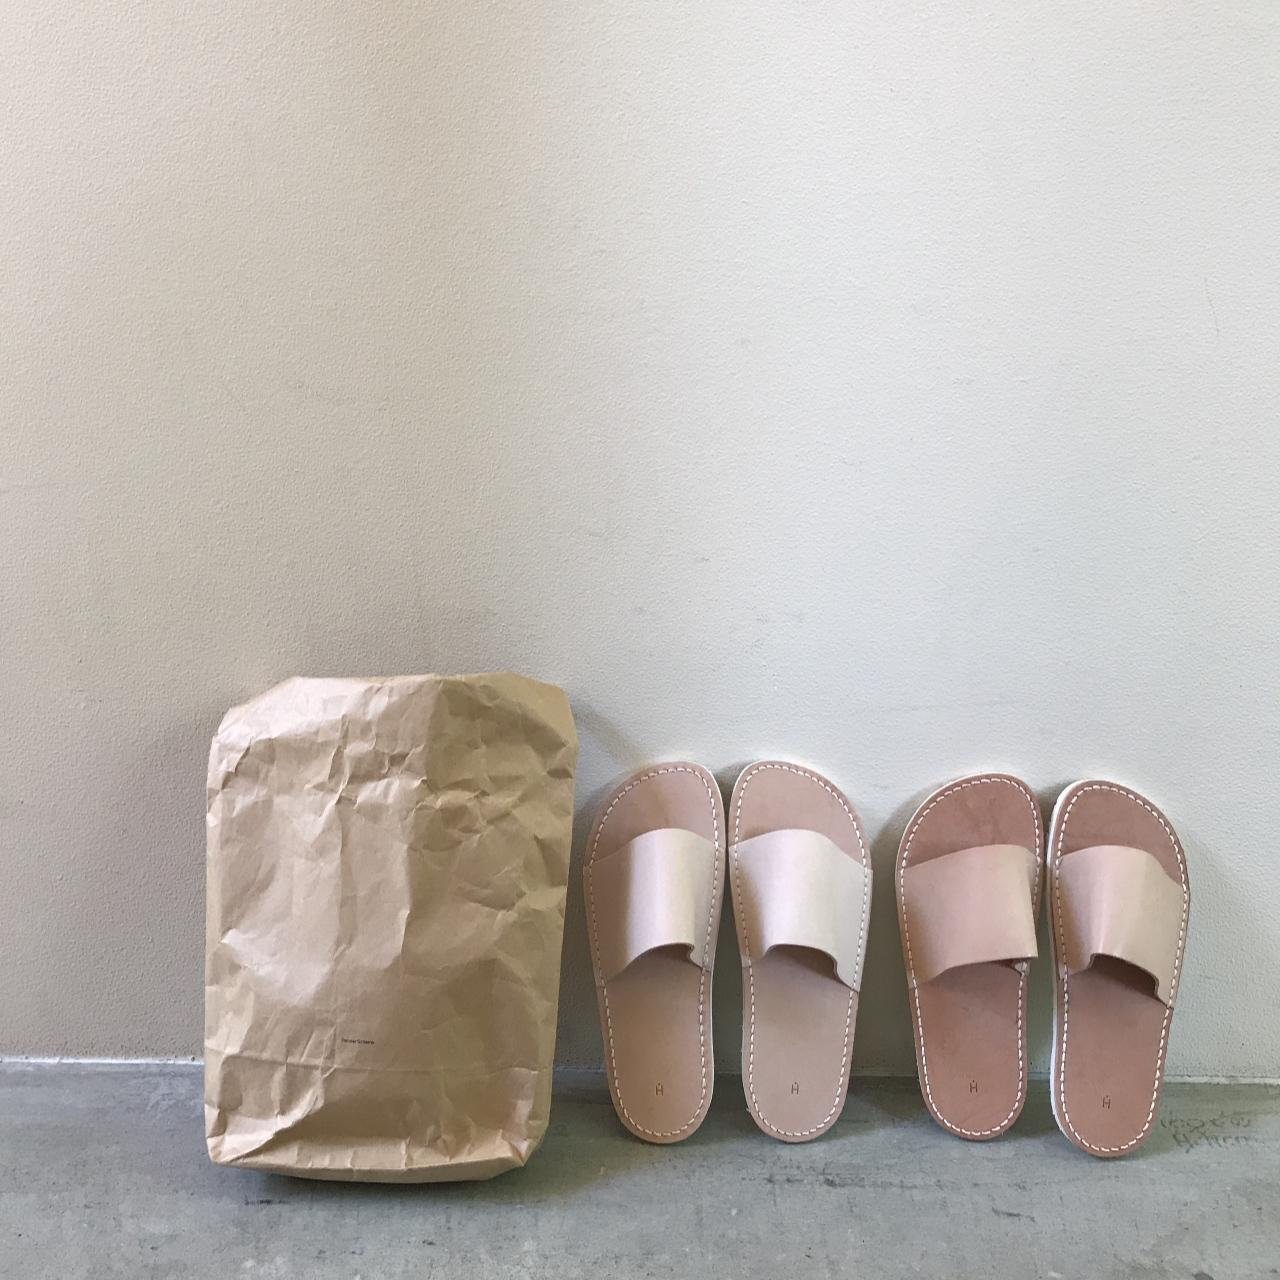 Hender Scheme - atelier slipper